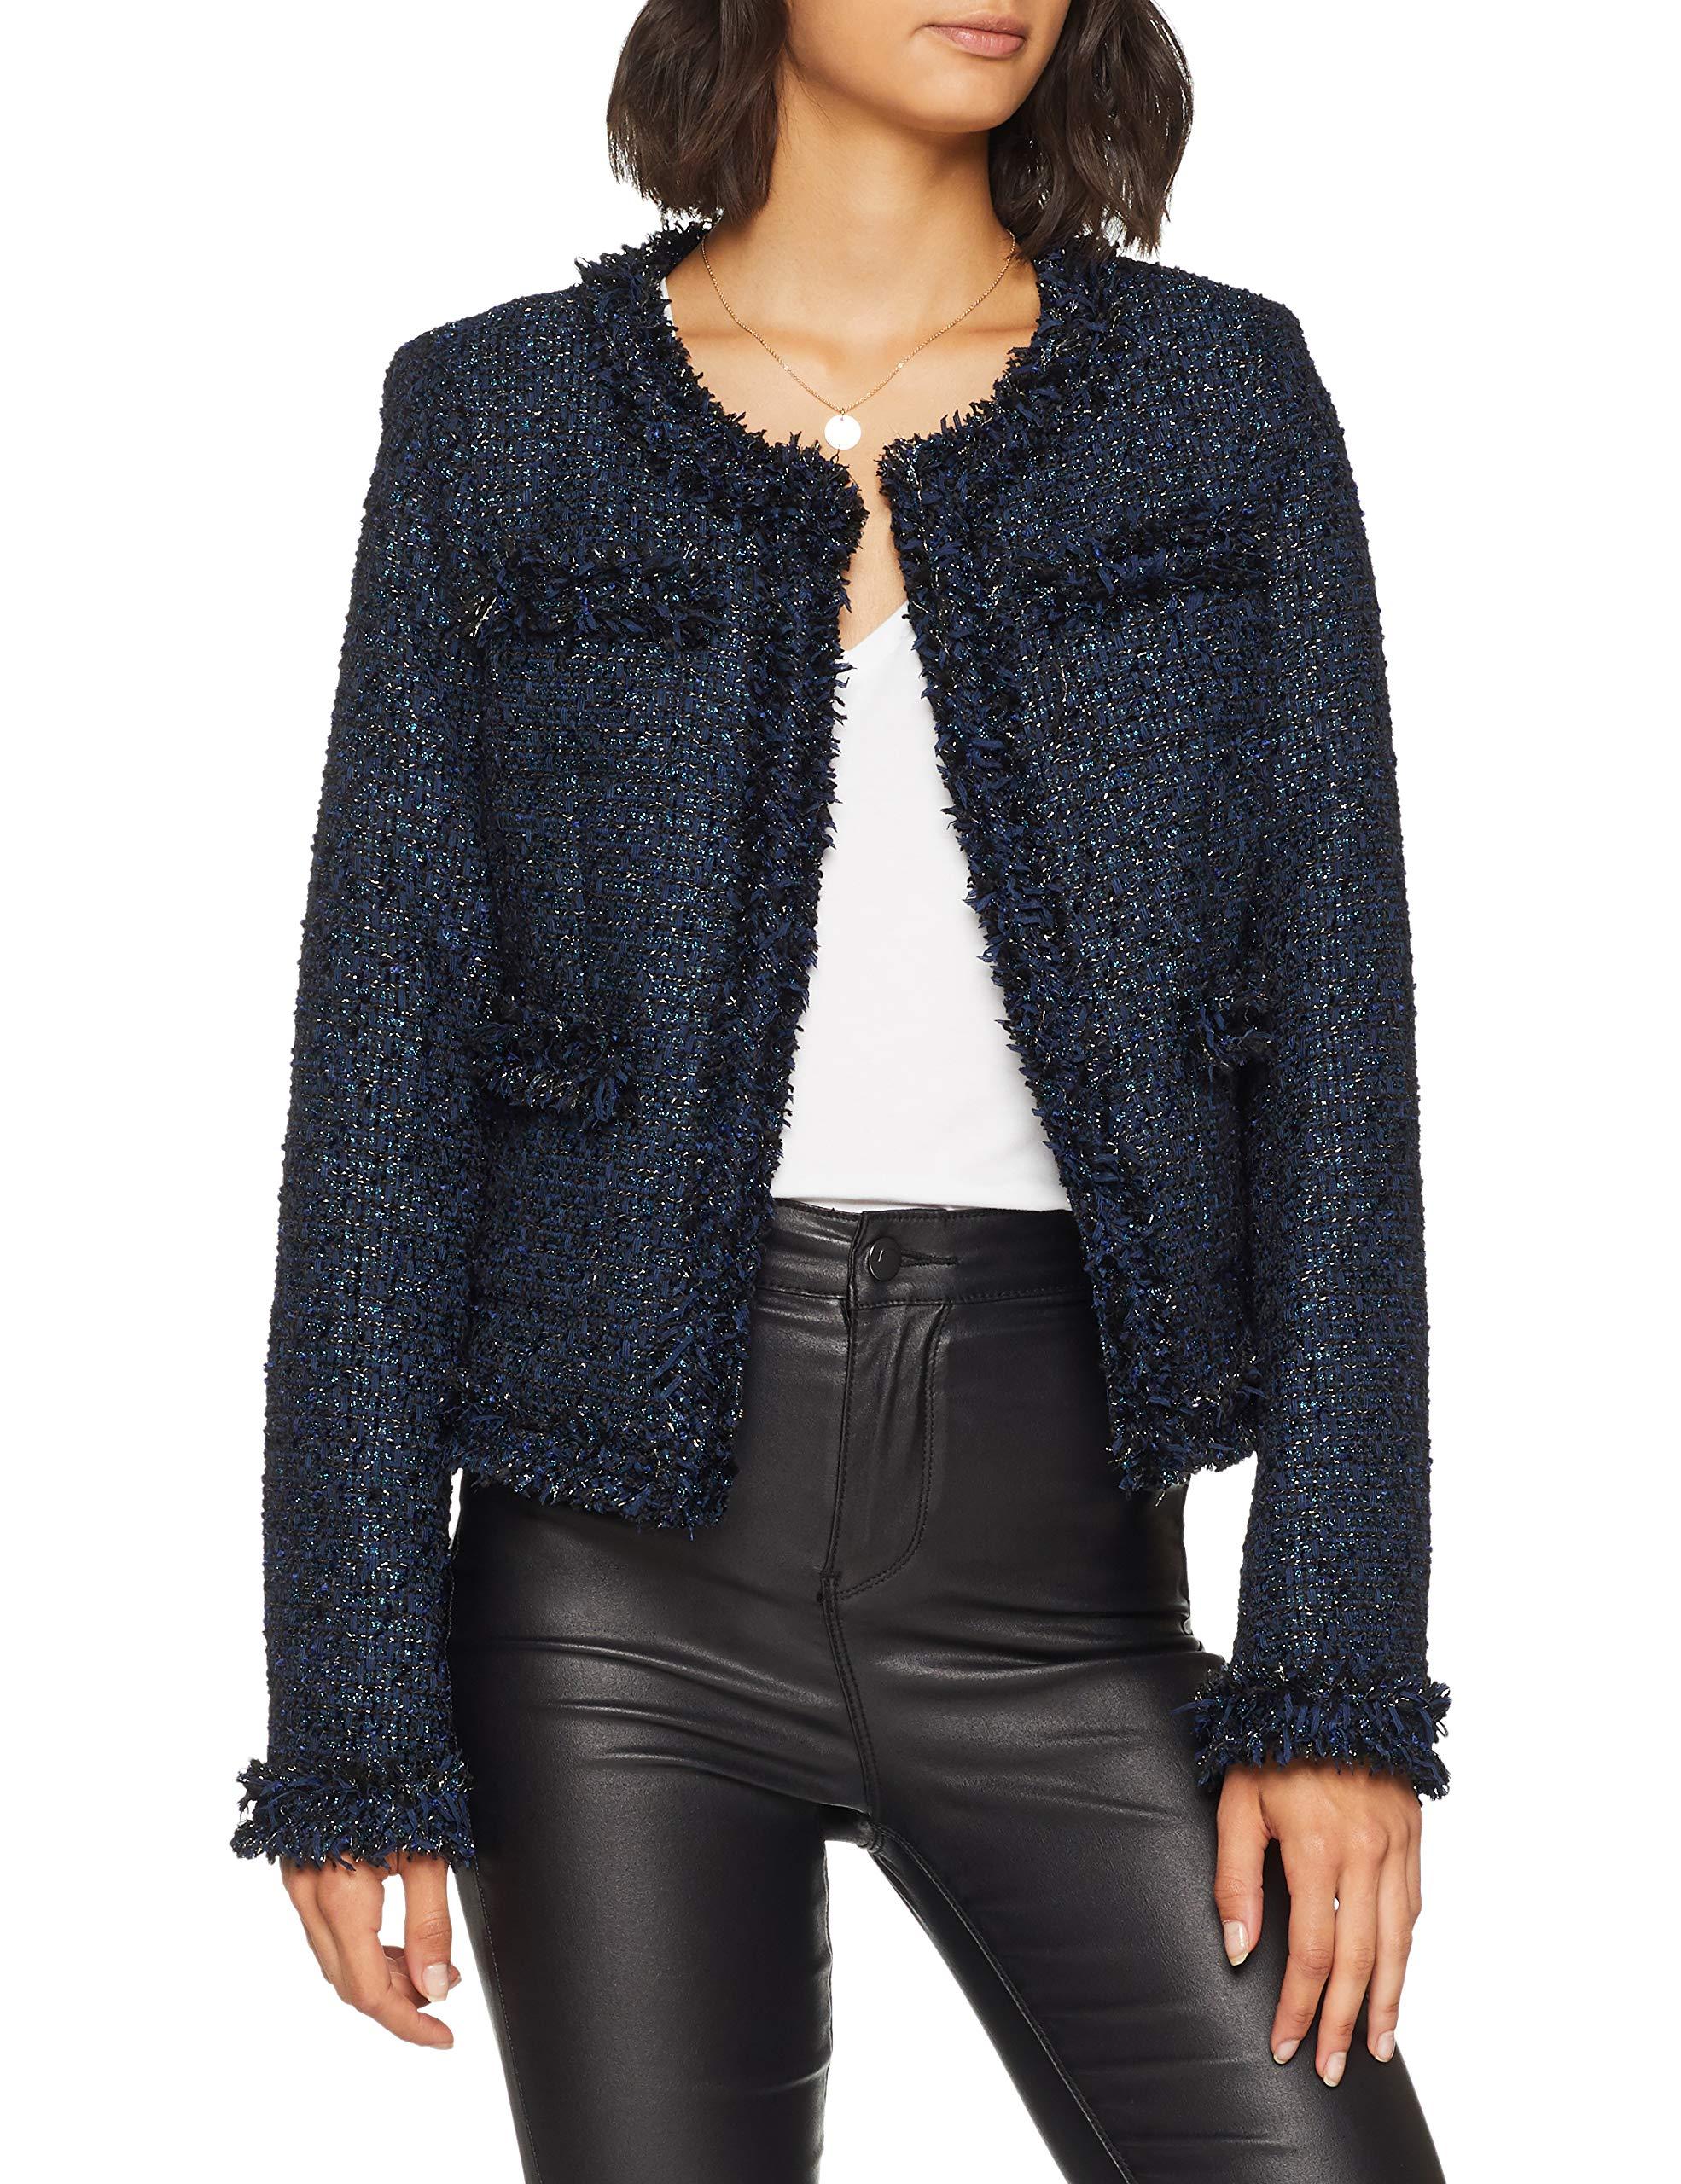 Femme blue Guess Giubbotti Com Jacket Black Ft61Medium Elisa ManteauMulticoloretweed 7Ybfvgy6